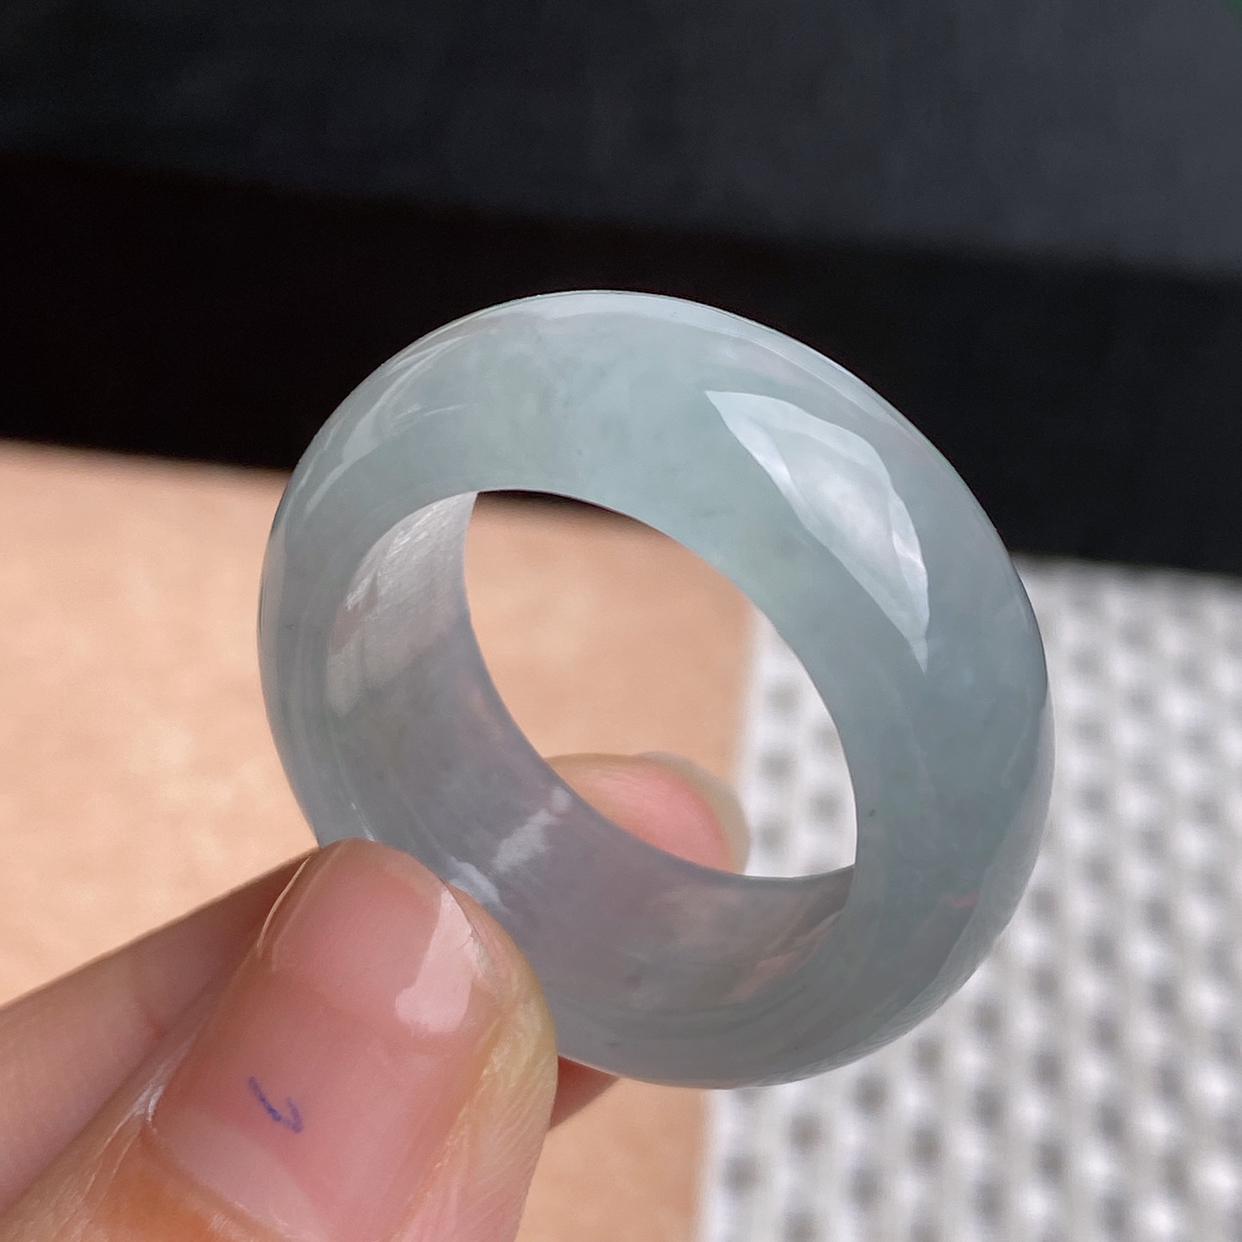 A货翡翠-种好冰润戒指,尺寸-20.6*10.6*4.7mm内径20.6mm26号